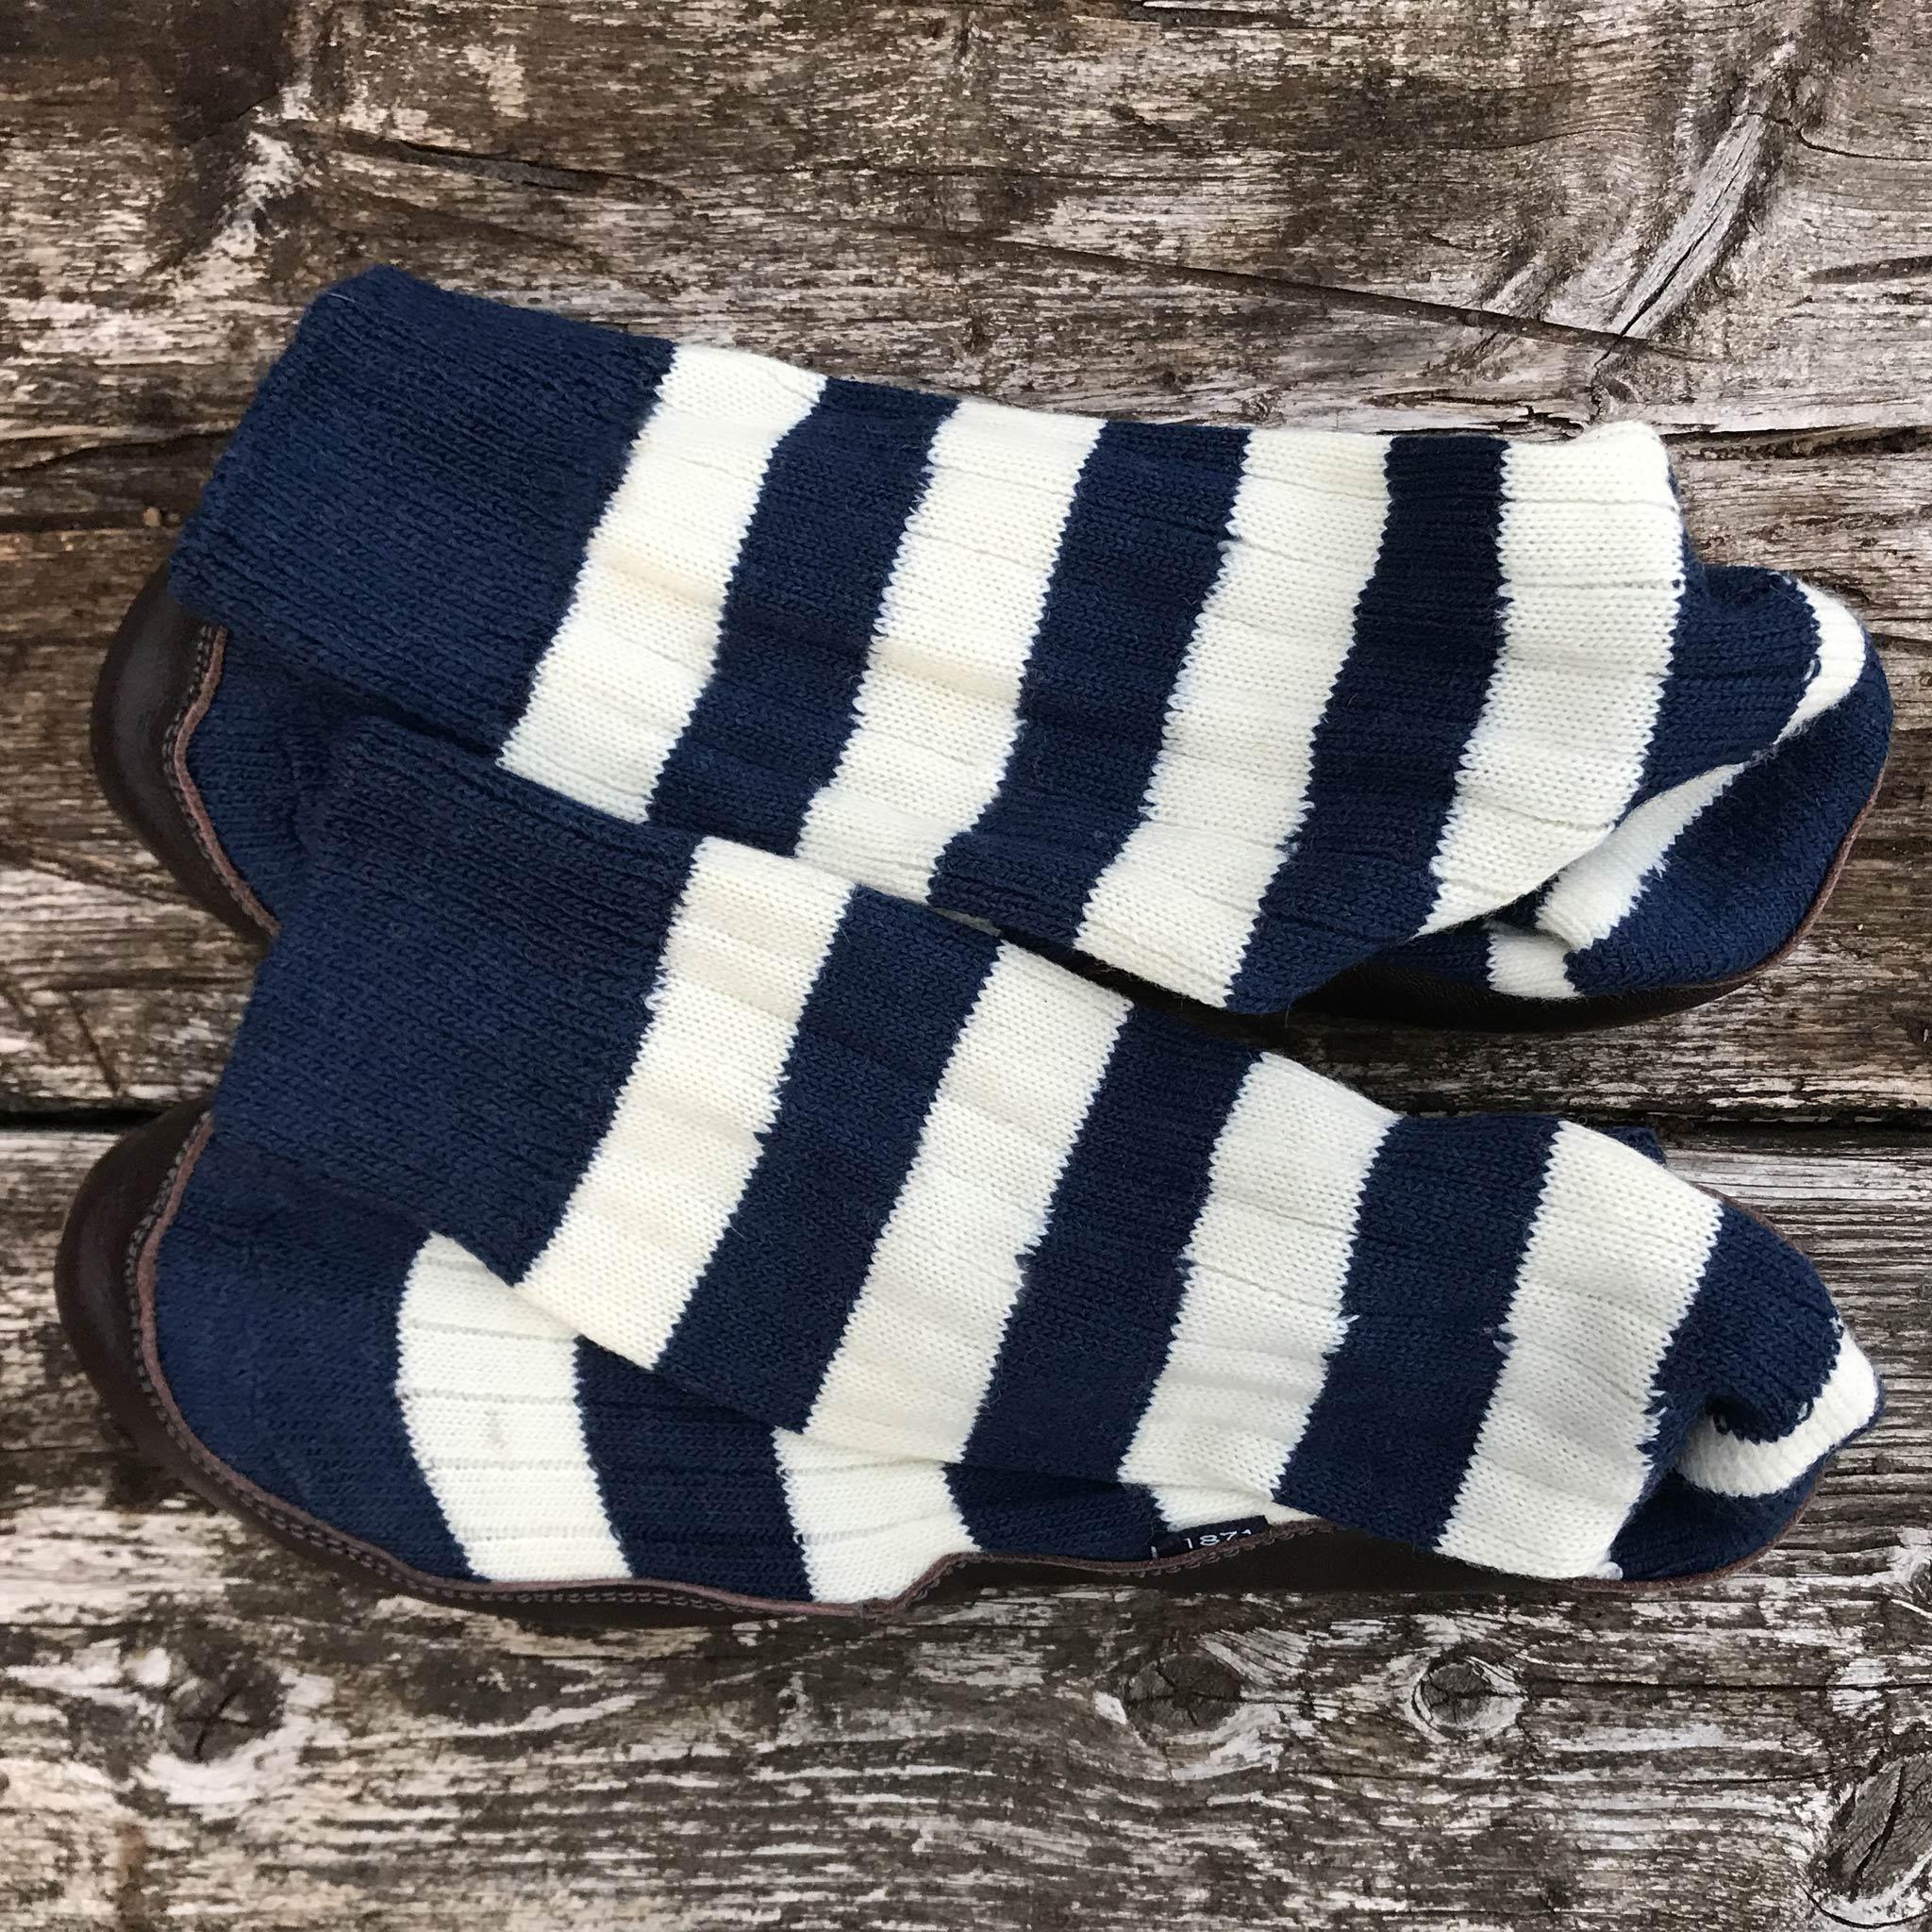 Slipper Sock blue and white stripe - overhead view